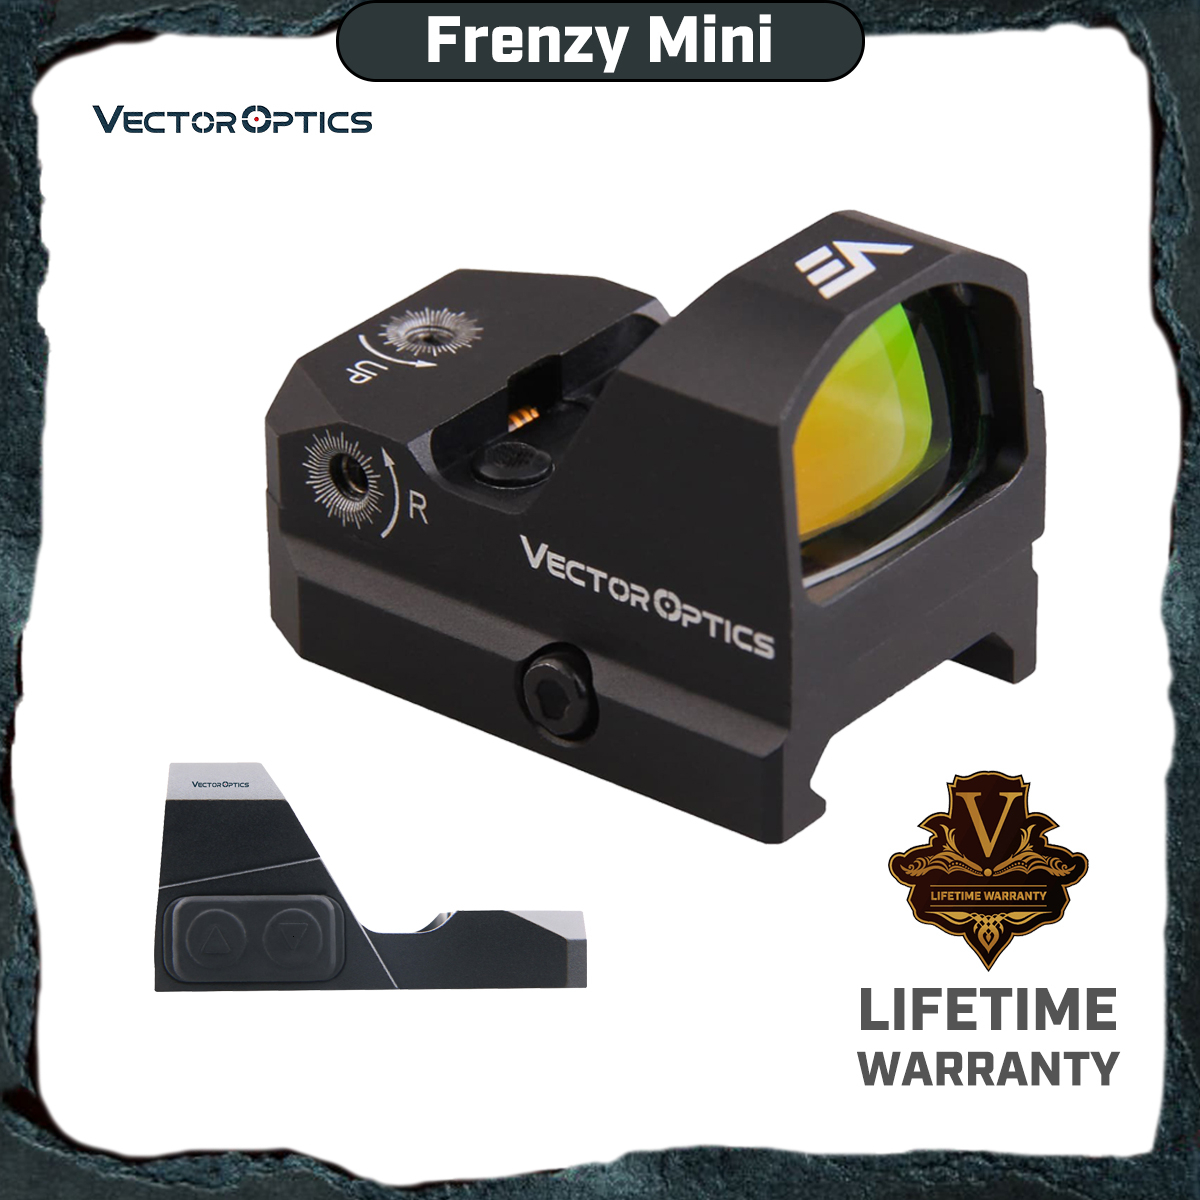 sistema otico do vetor frenesi 1x17x24 red dot scope pistola mira ipx6 a prova de agua